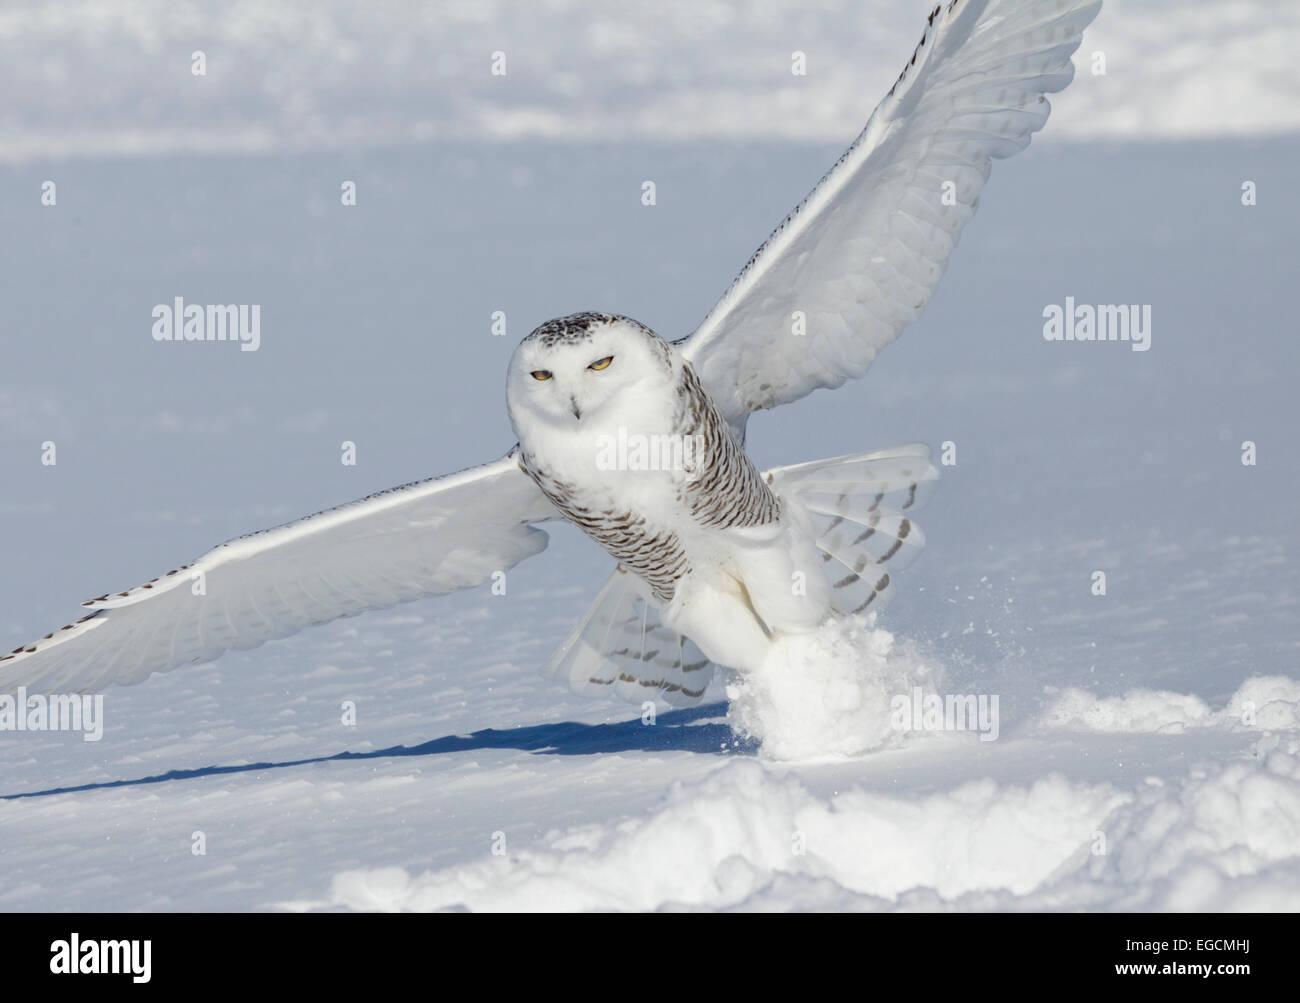 Snowy Owl Striking Prey in Snow - Stock Image